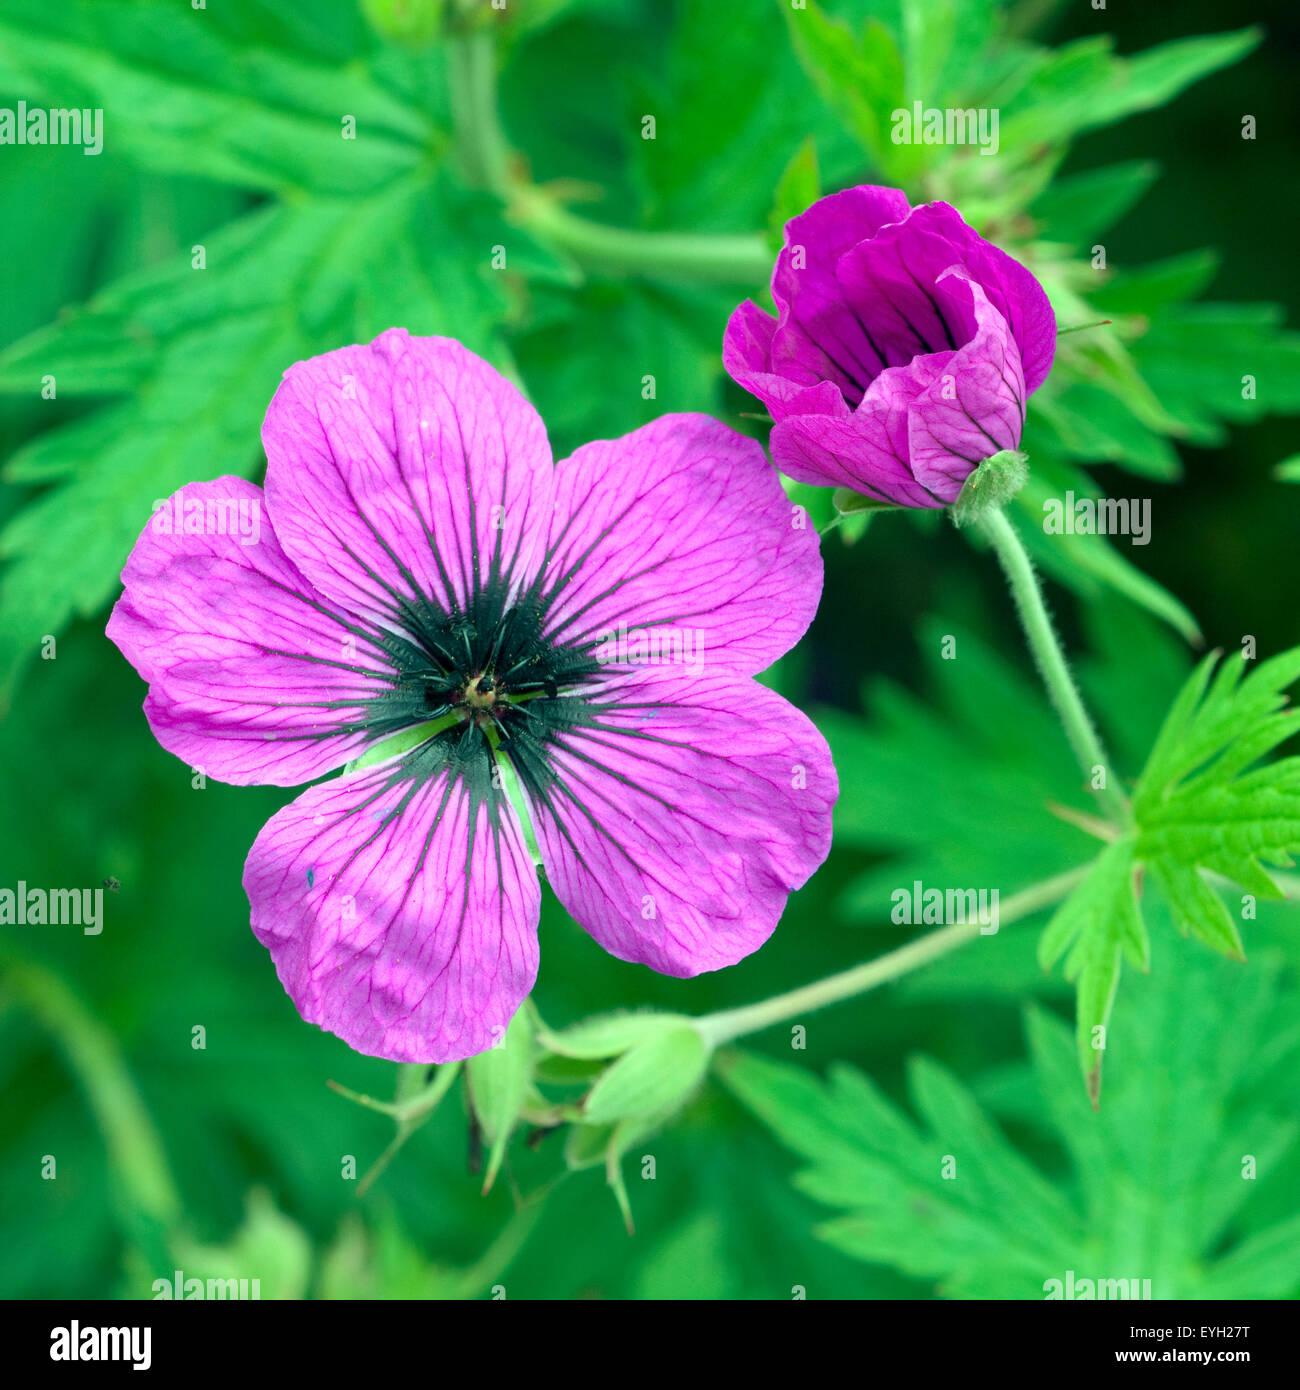 Storchschnabel, Geranium, psilostemon, Kolchis, - Stock Image